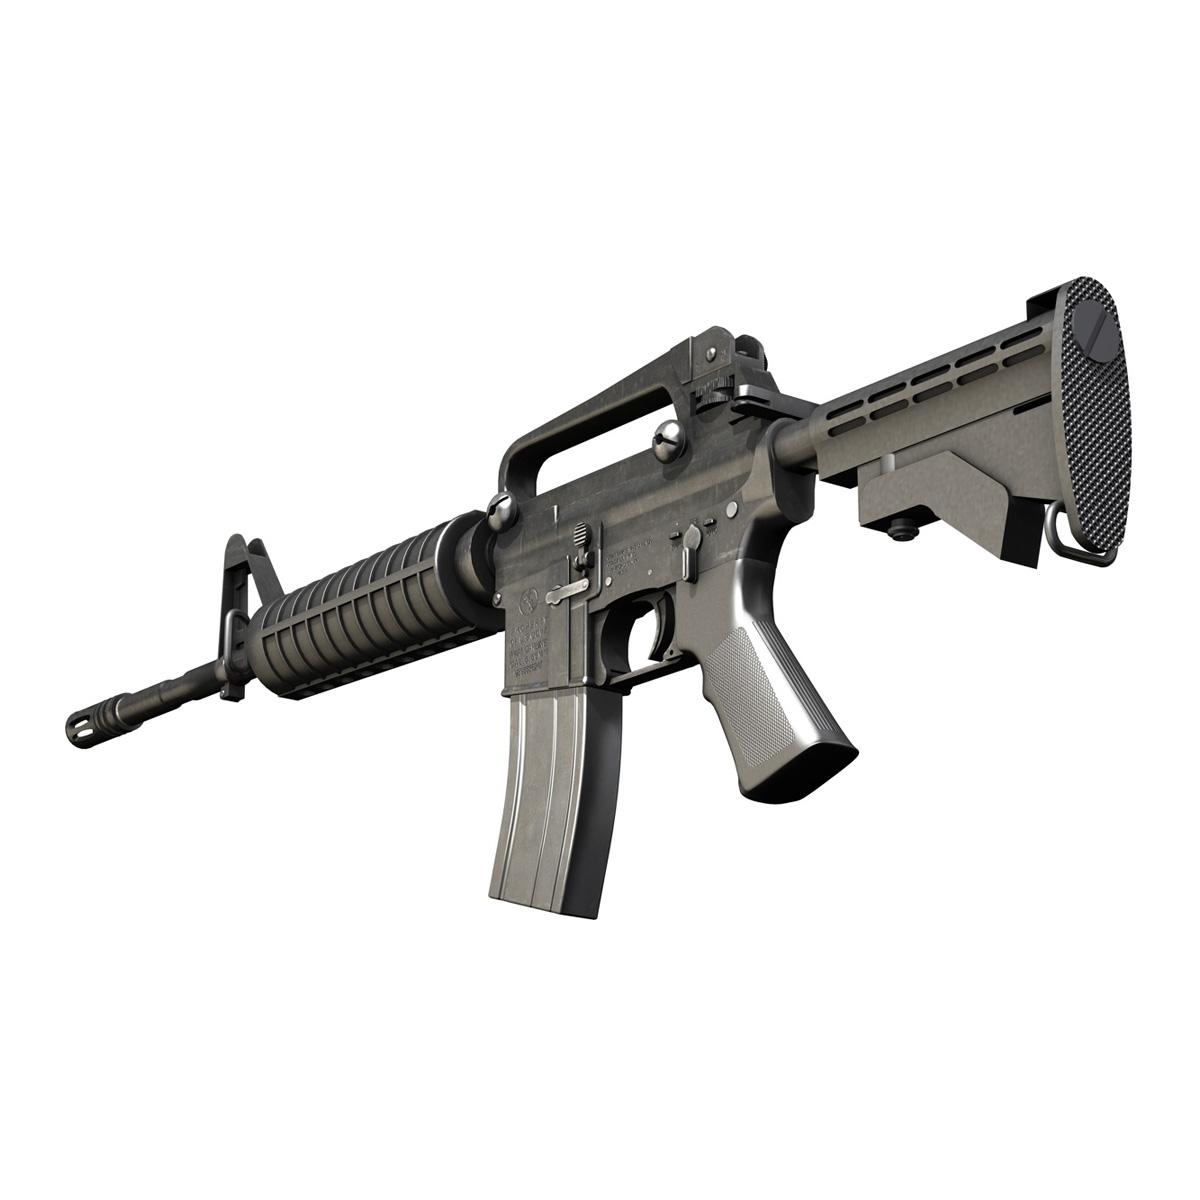 colt m4a1 carbine довтолгооны буу 3d загвар 3ds fbx c4d lwo obj 187787